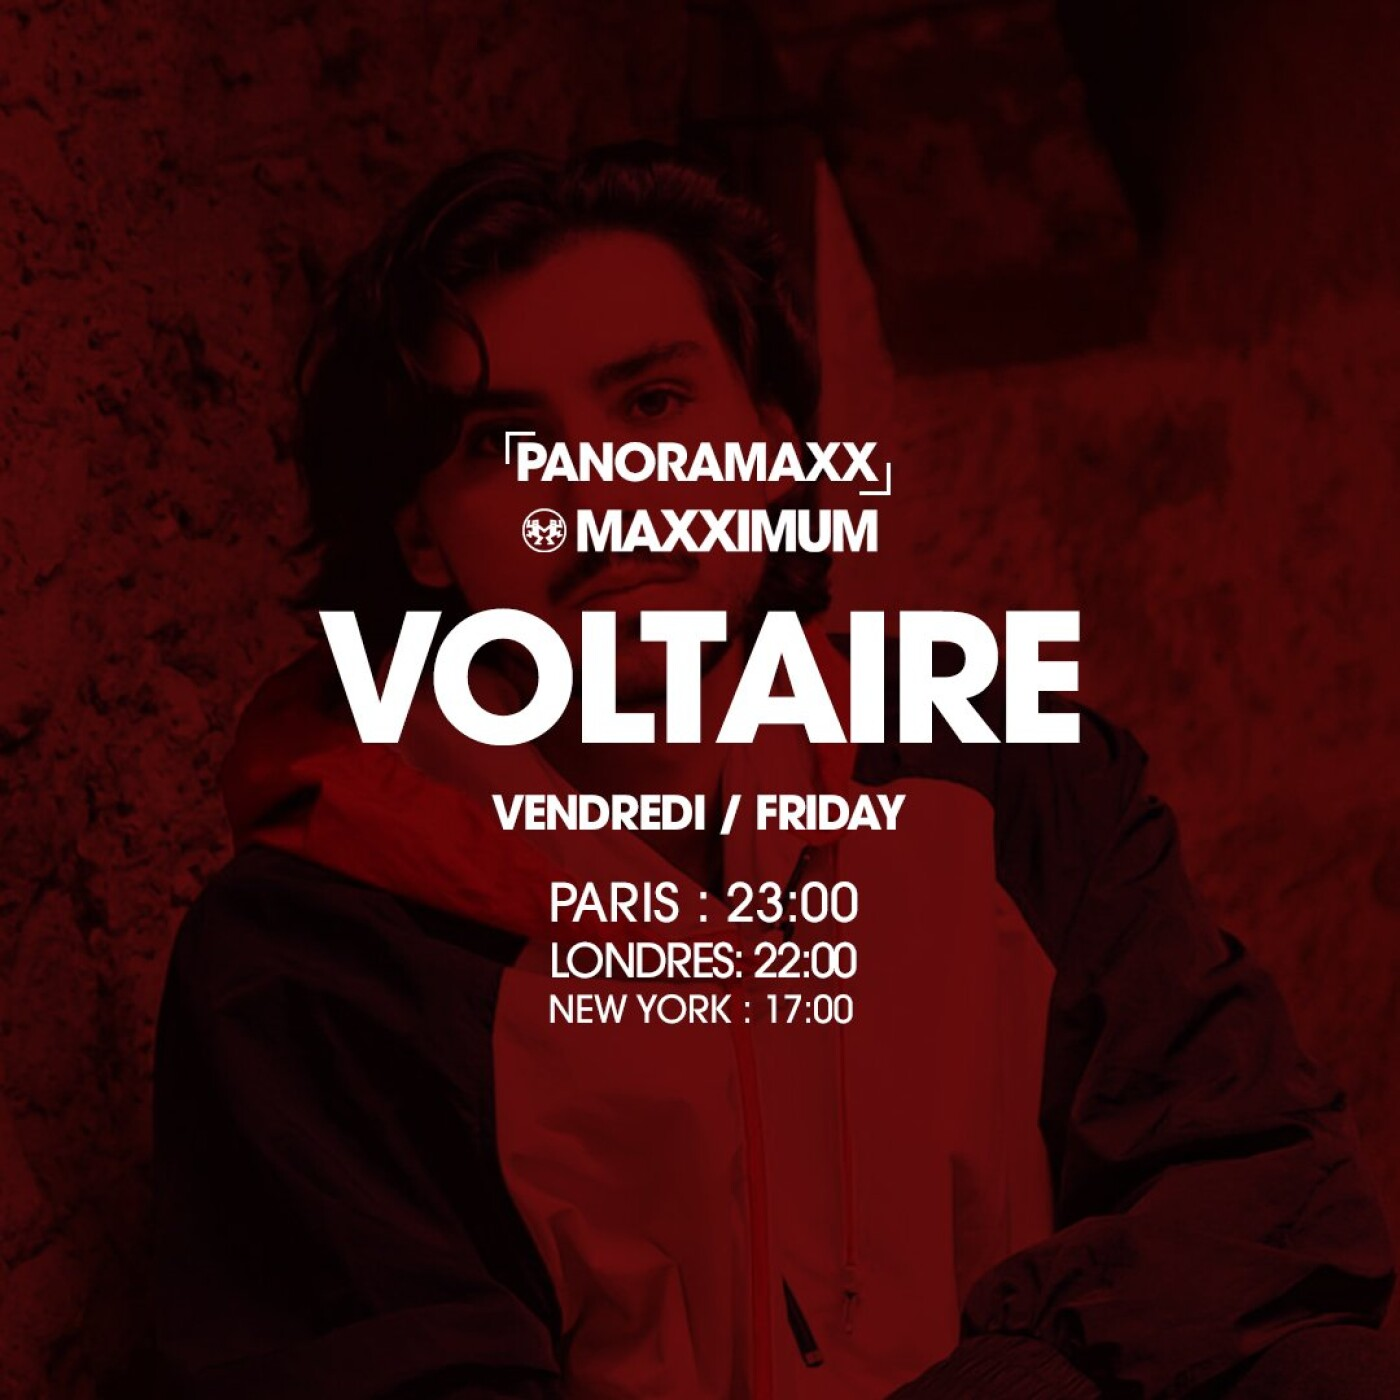 PANORAMAXX : VOLTAIRE